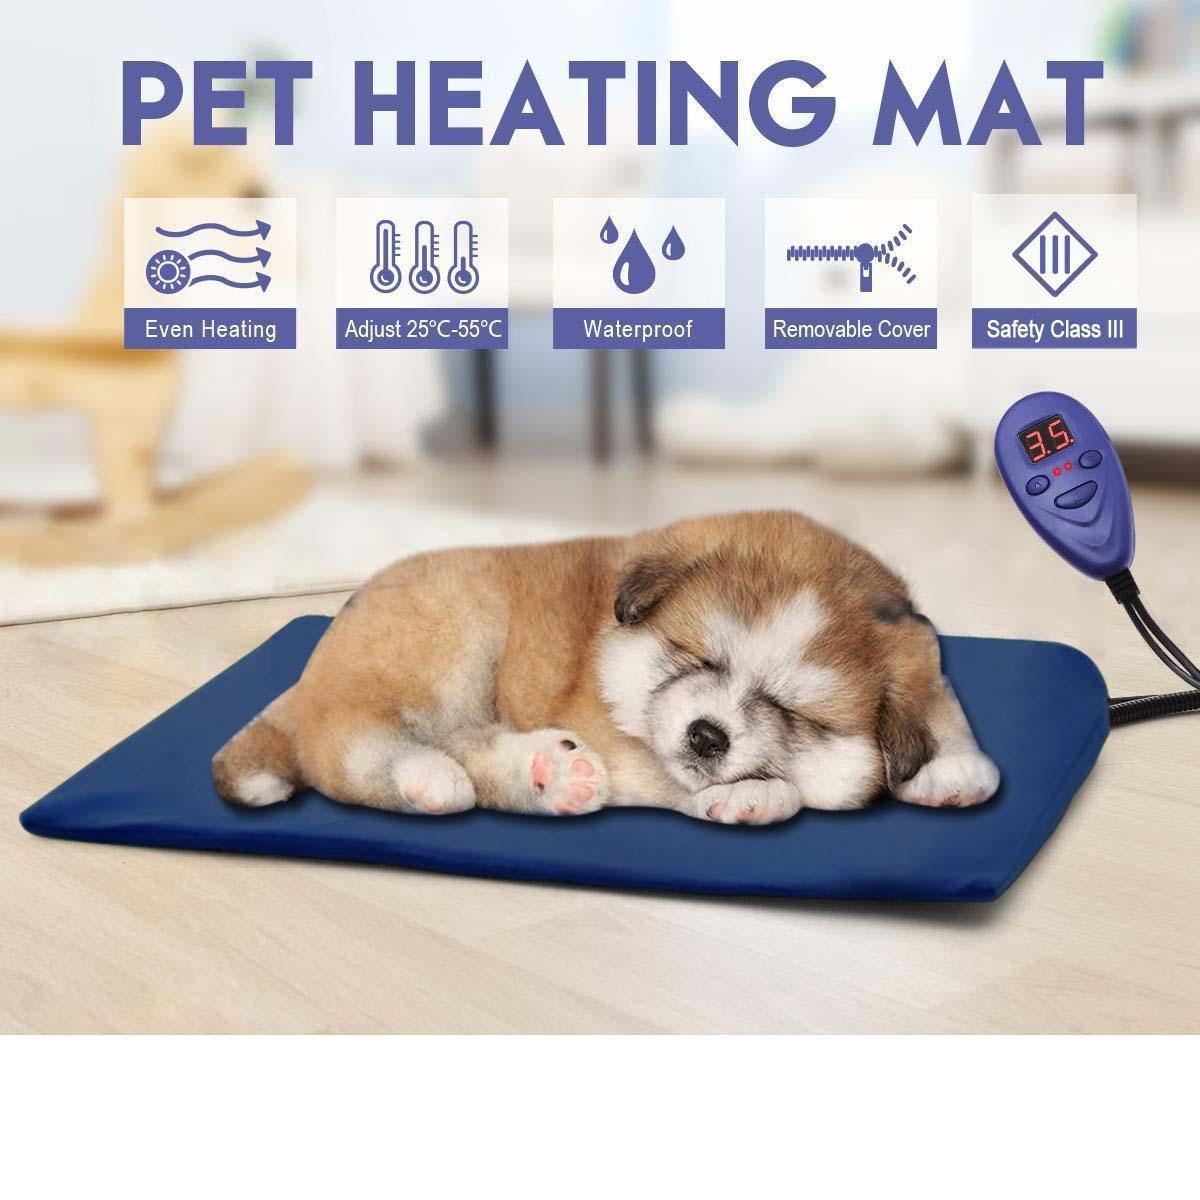 xueyan Mascota manta eléctrica almohadilla de calefacción a prueba de agua anti-mordida calefacción eléctrica termostato calefacción calentador perro gato conejo caliente, 4030cm, azul